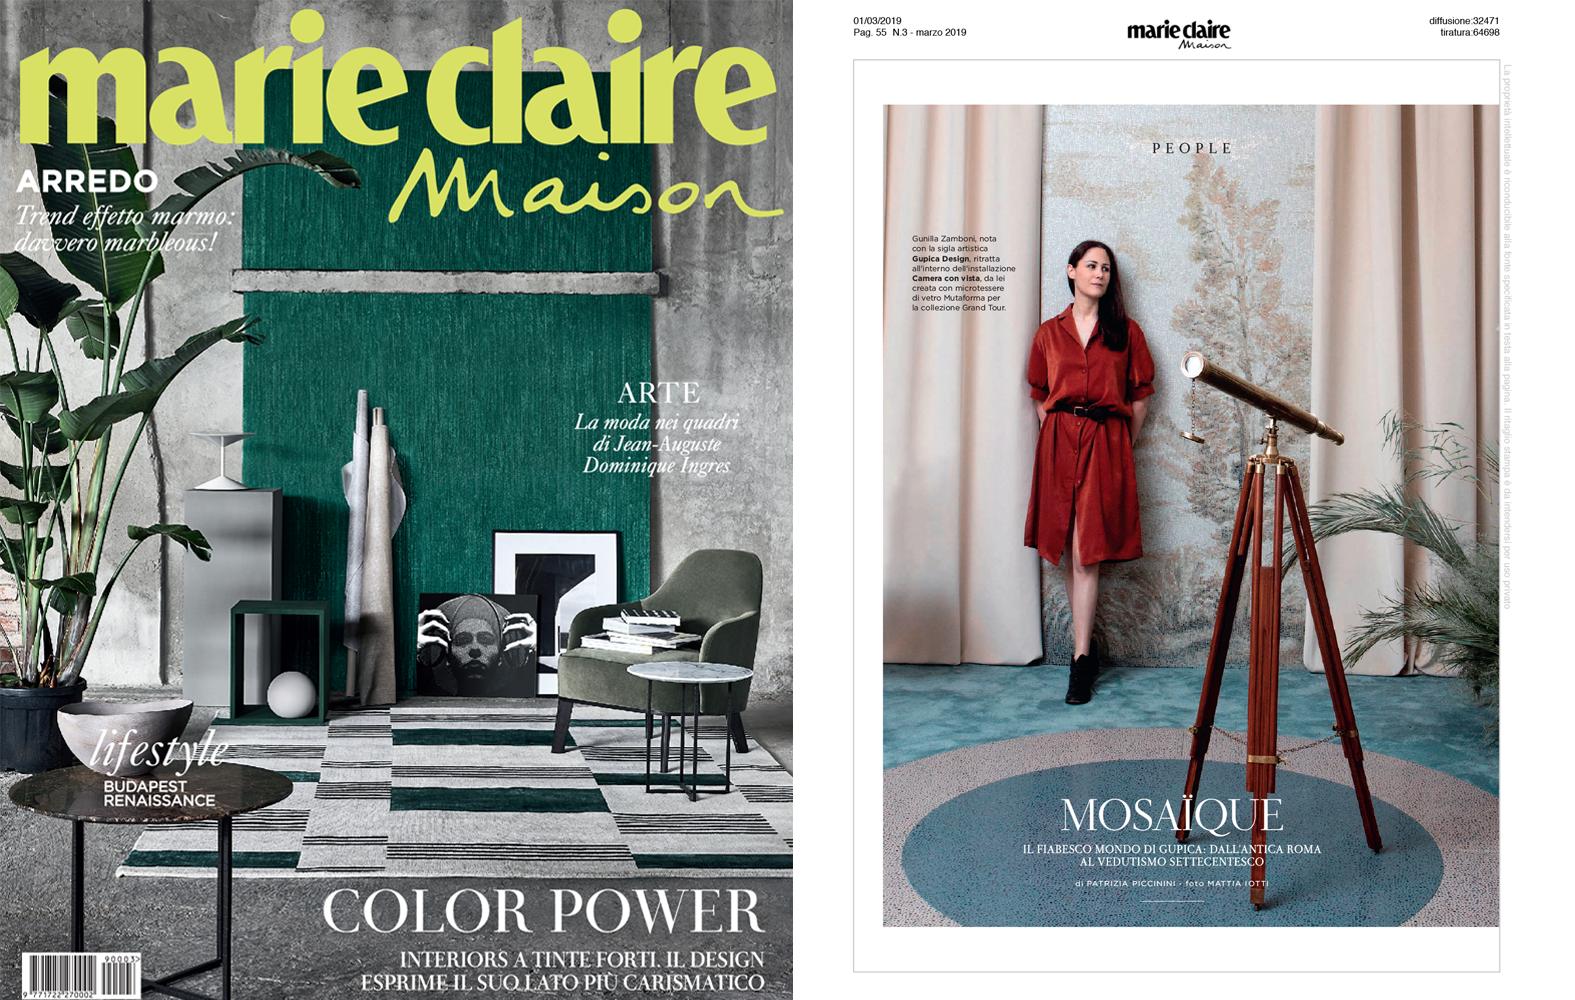 Gupica-press-MarieClaire-mar2019-ARTICLE-1